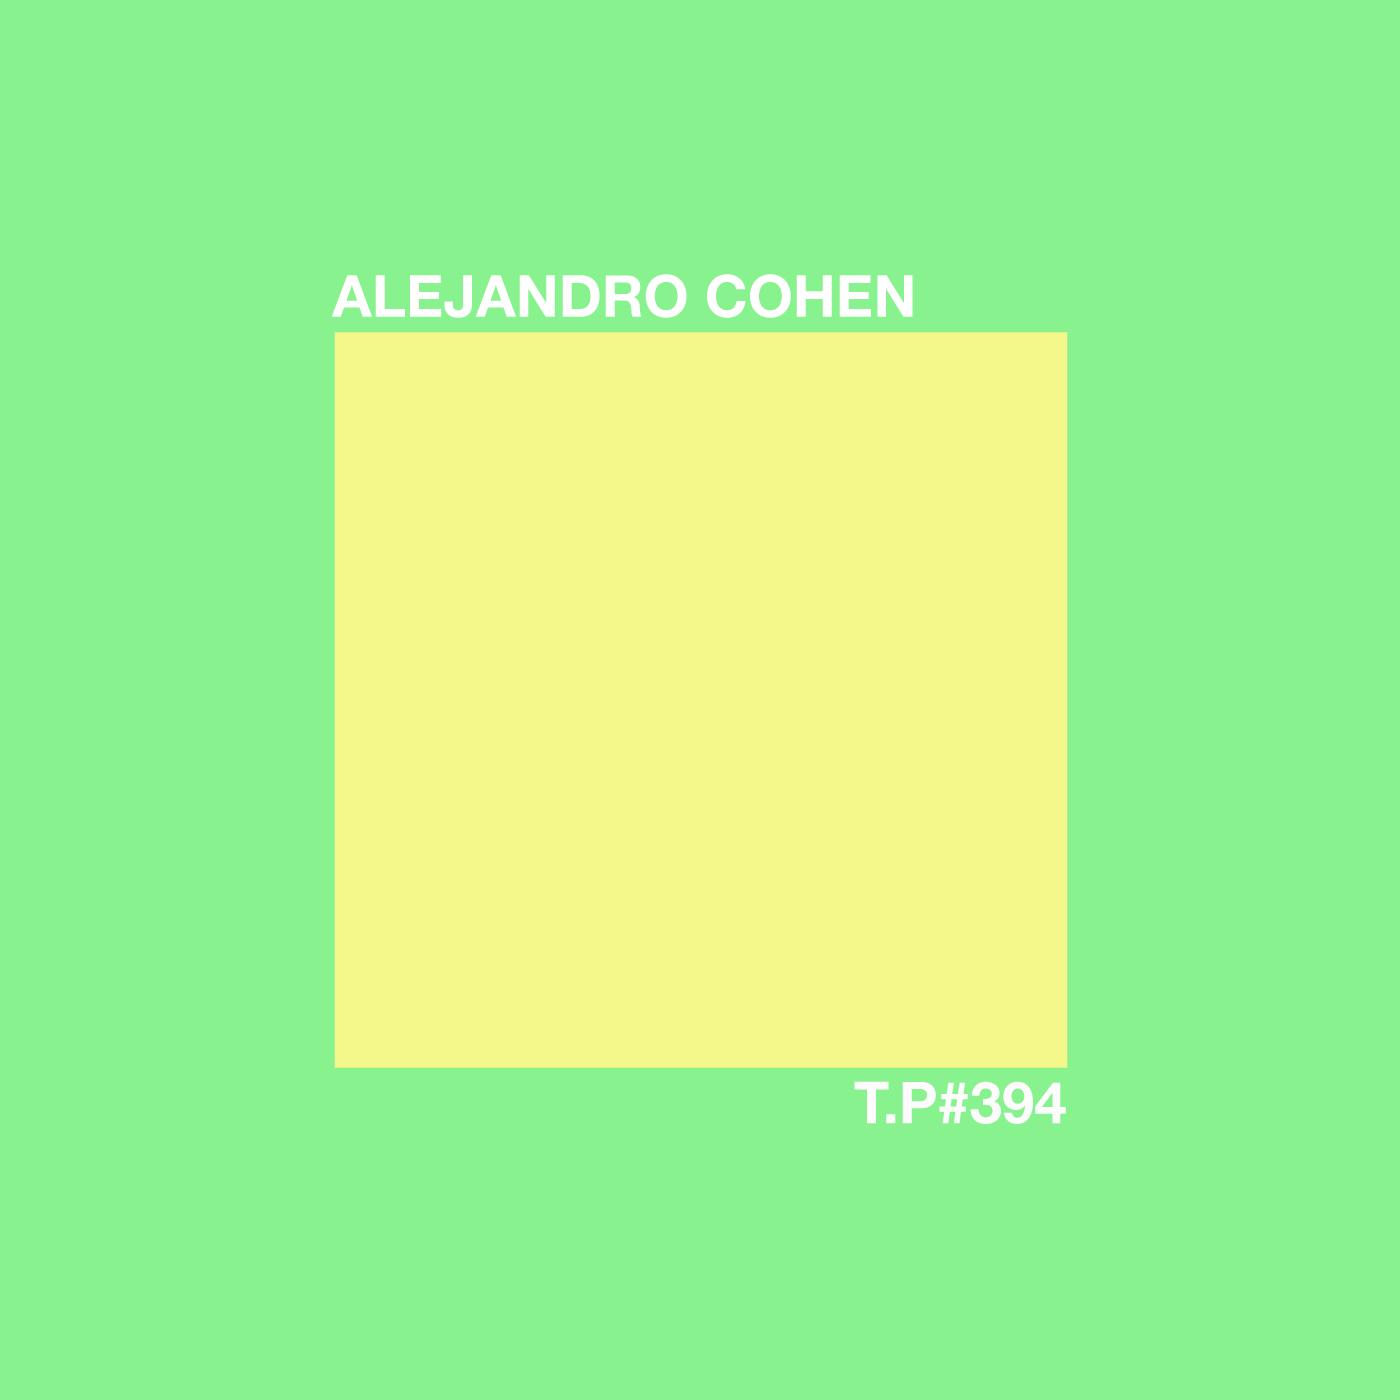 Alejandro Cohen, Proyeccion Folklorica, Test Pressing, Argentina, Genre, 1960s, Dublab, Mix